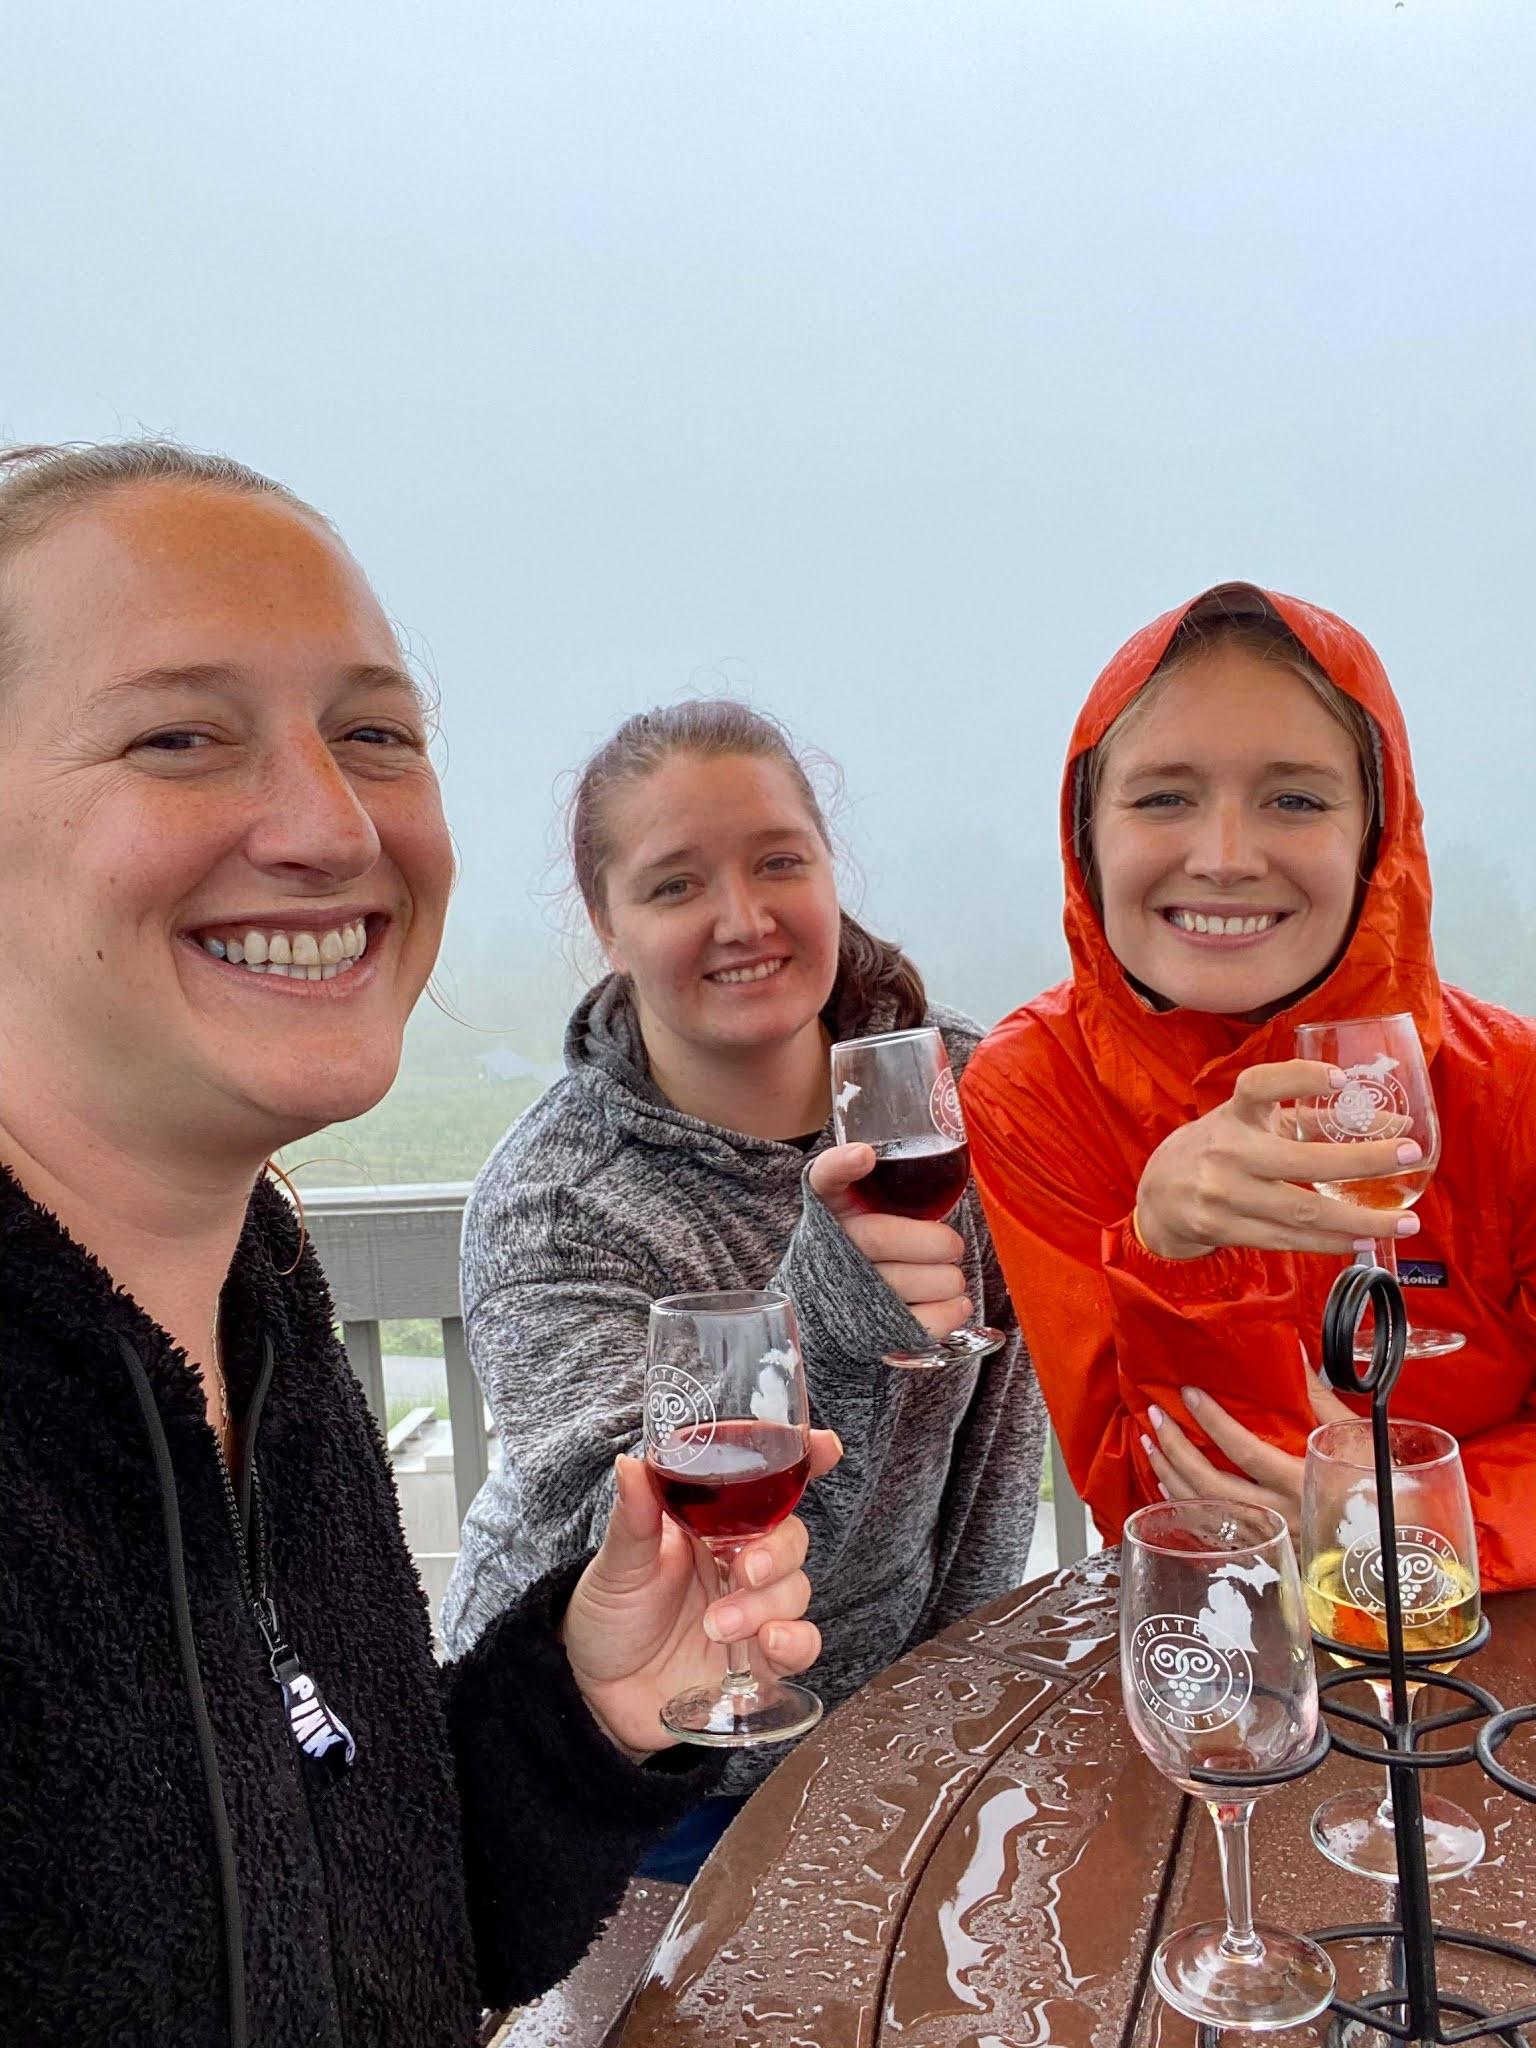 Wine Tasting in the Rain | www.biblio-style.com